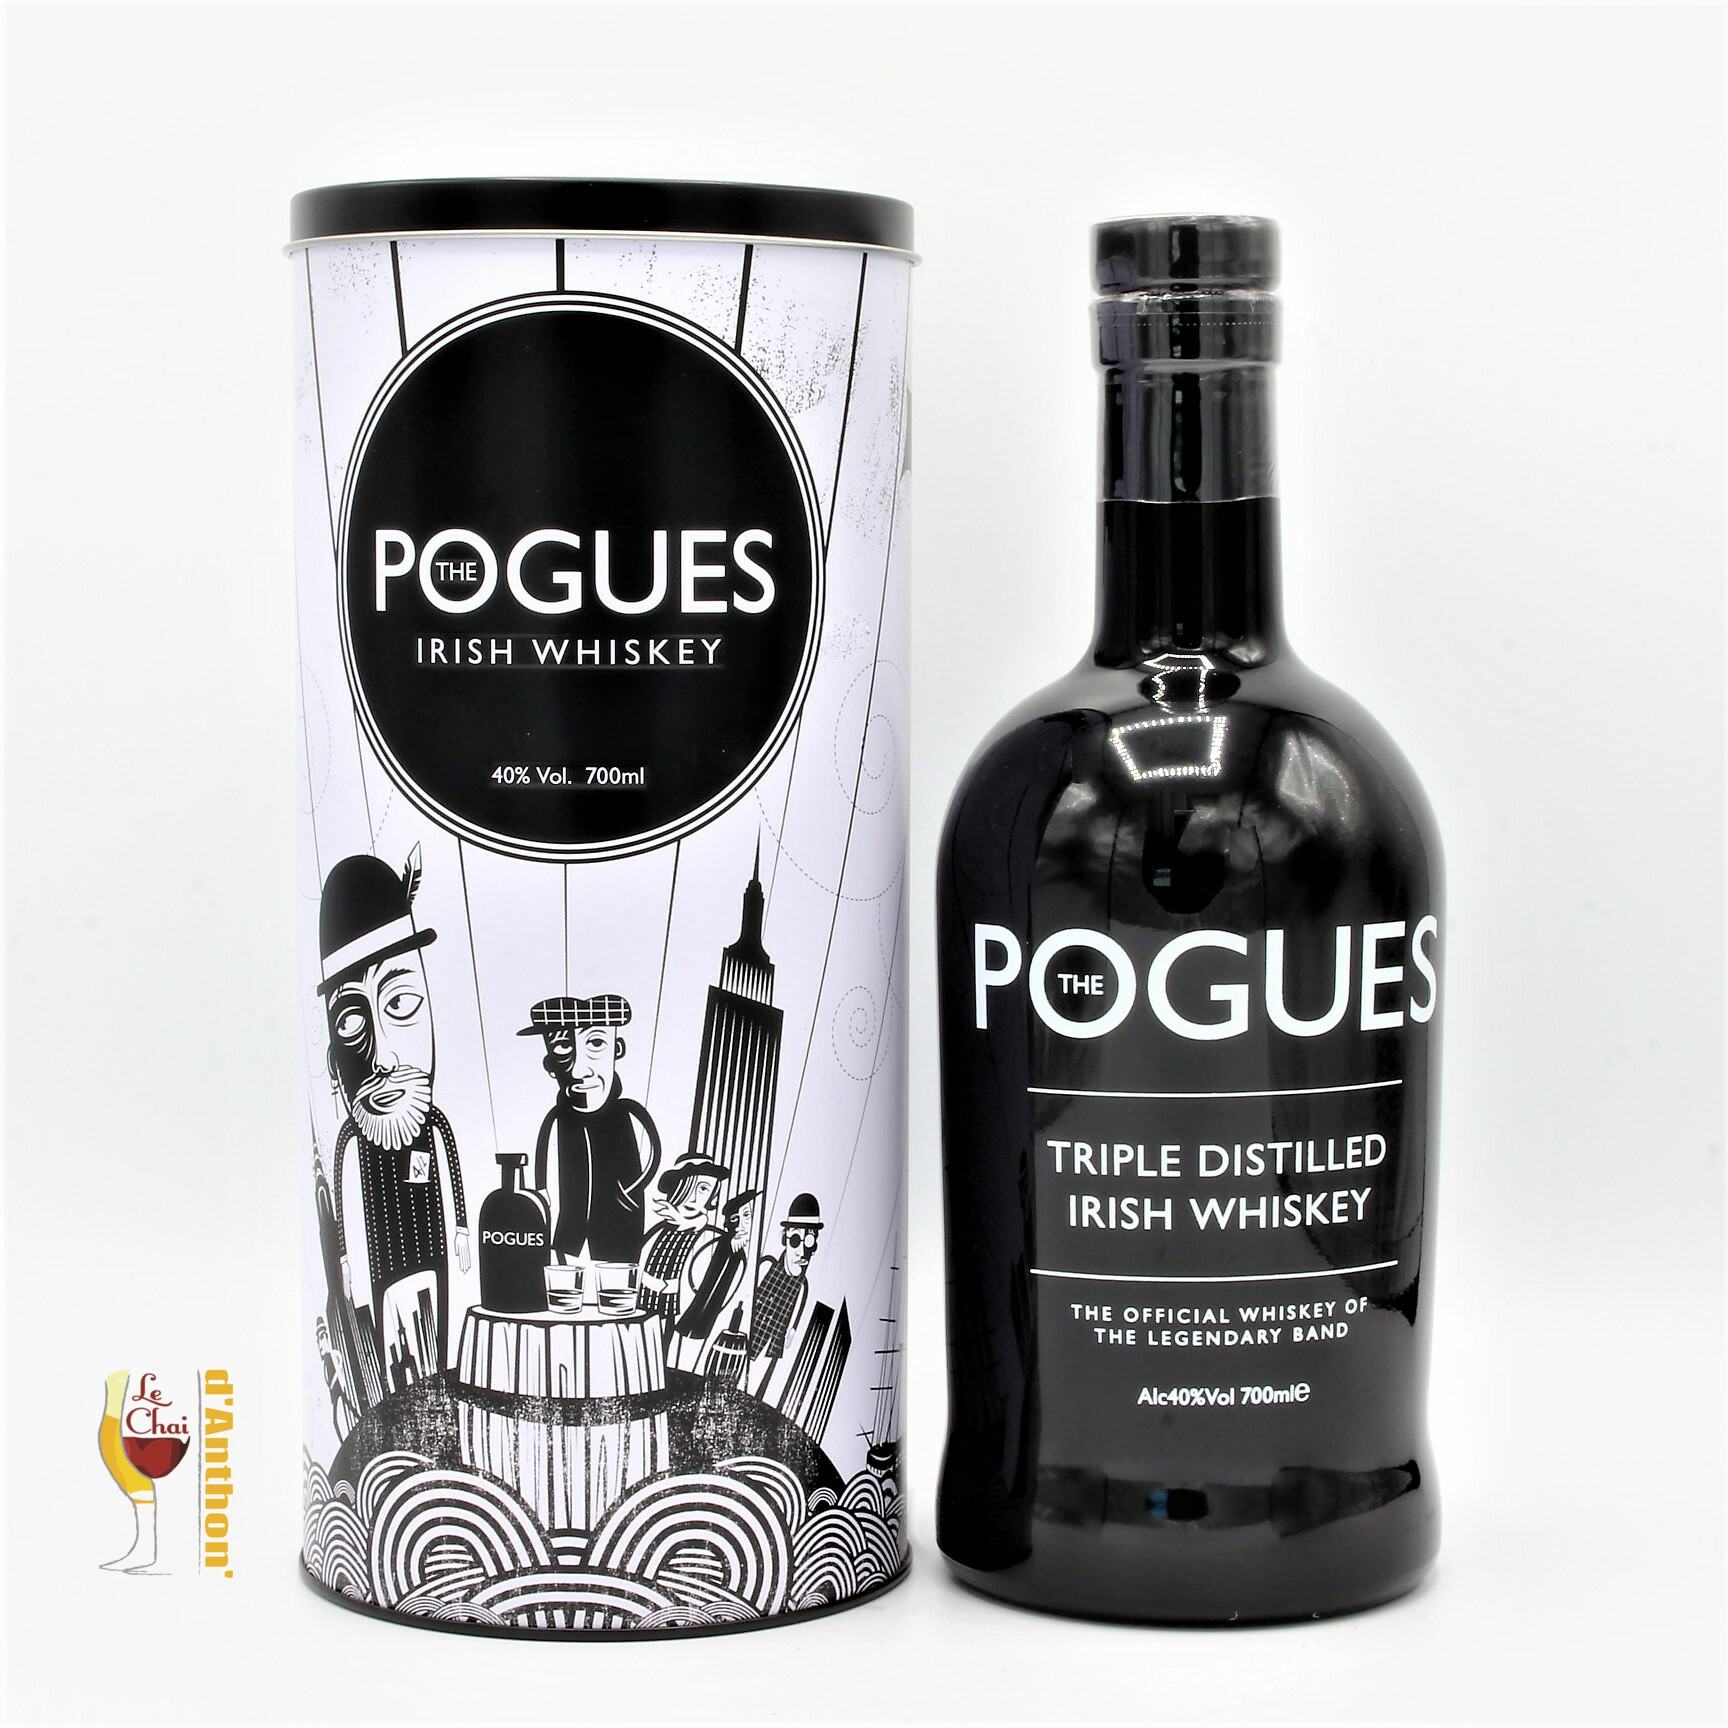 Le Chai D&905.JPG039;Anthon Spiritueux Whiskies Irish Blend The Pogues Blended 70cl 905